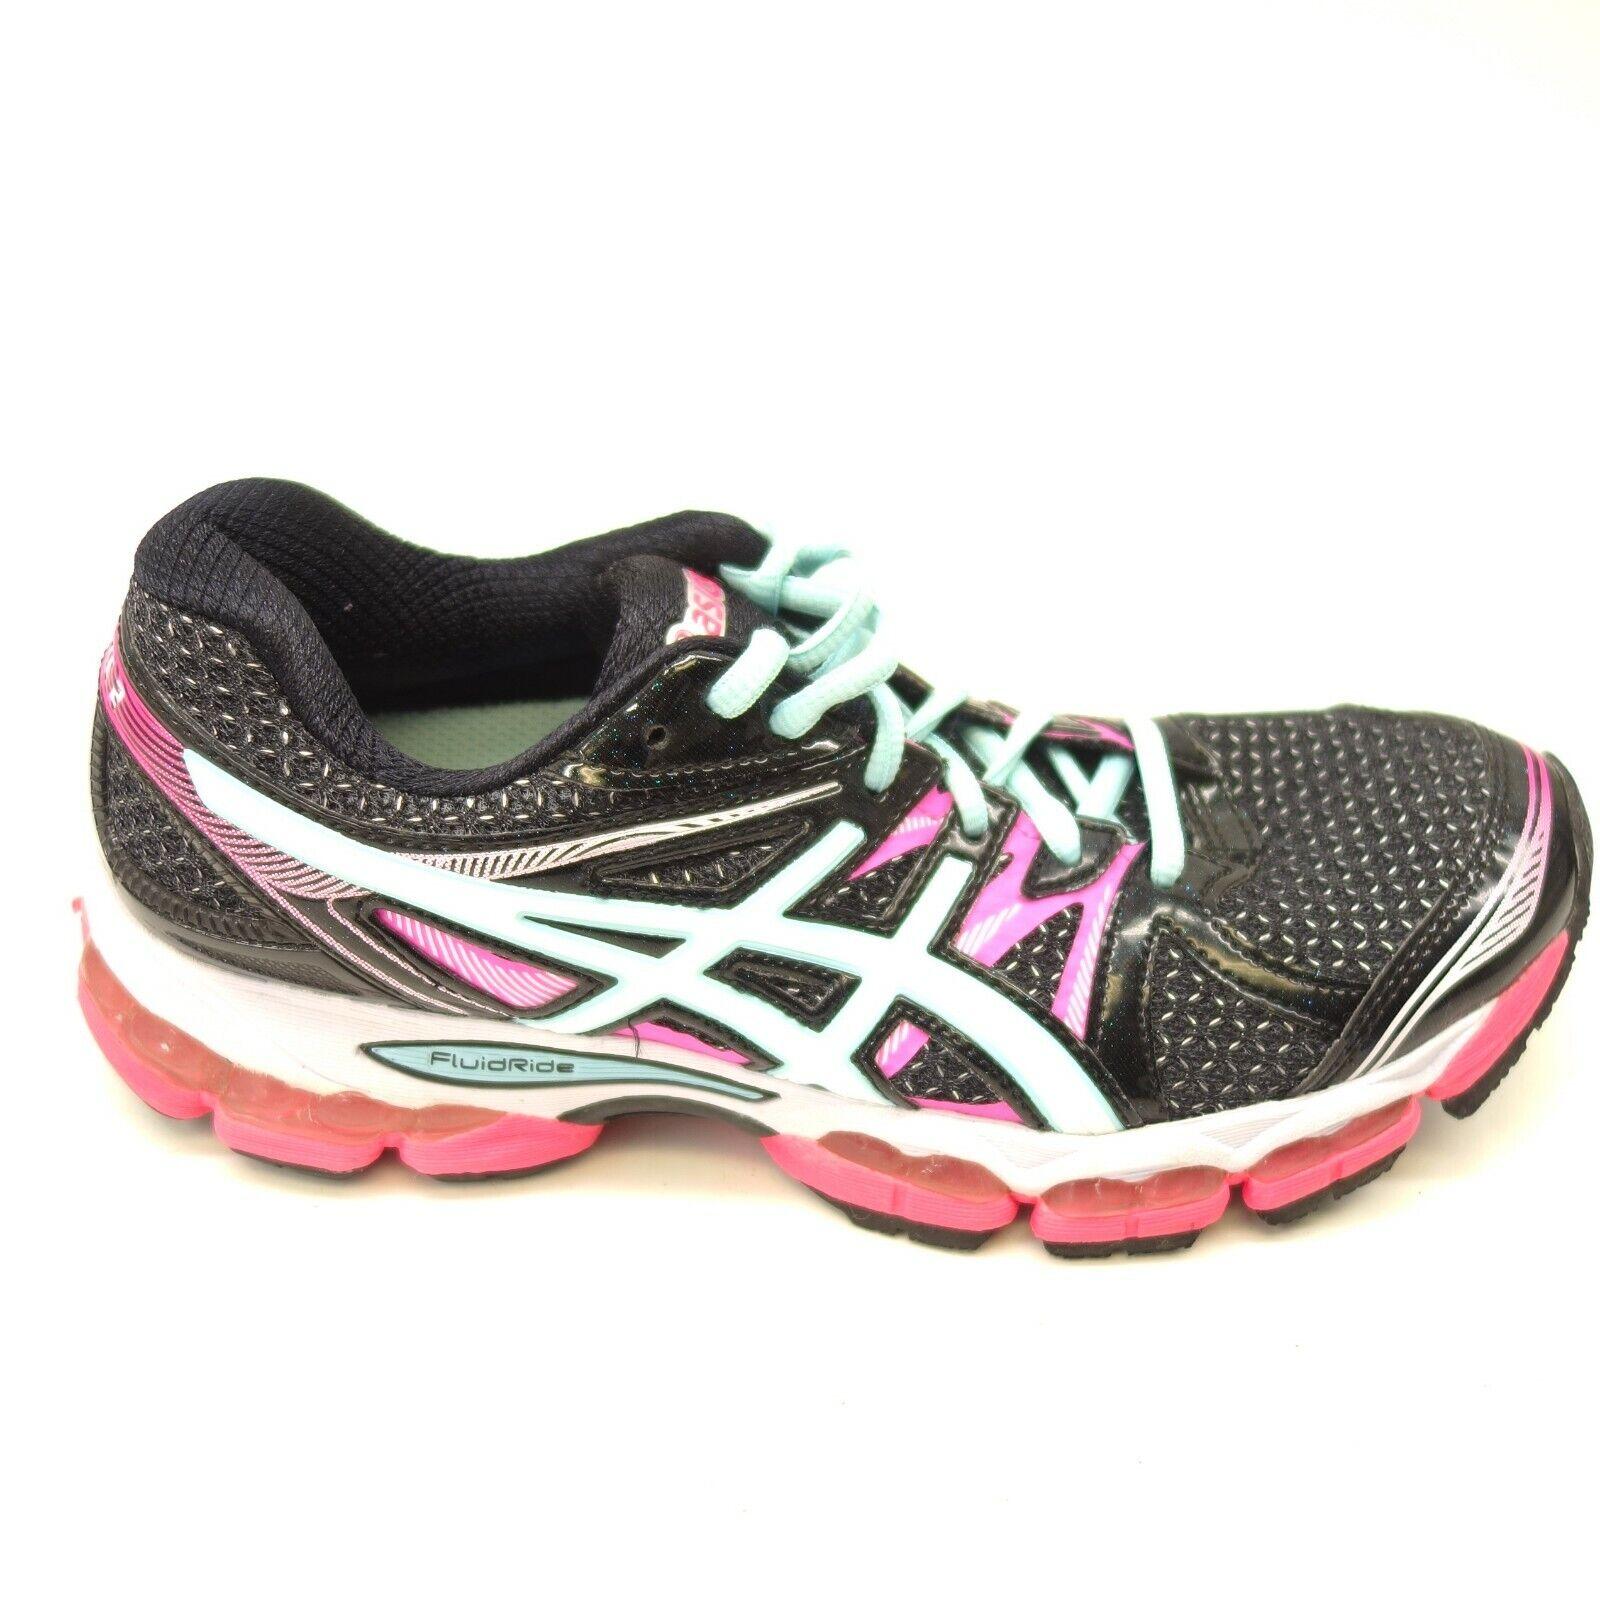 Asics Damen Us 8 Eu 39,5 Gel-Evate 2 Sportliche Laufen Kreuz Training Schuhe